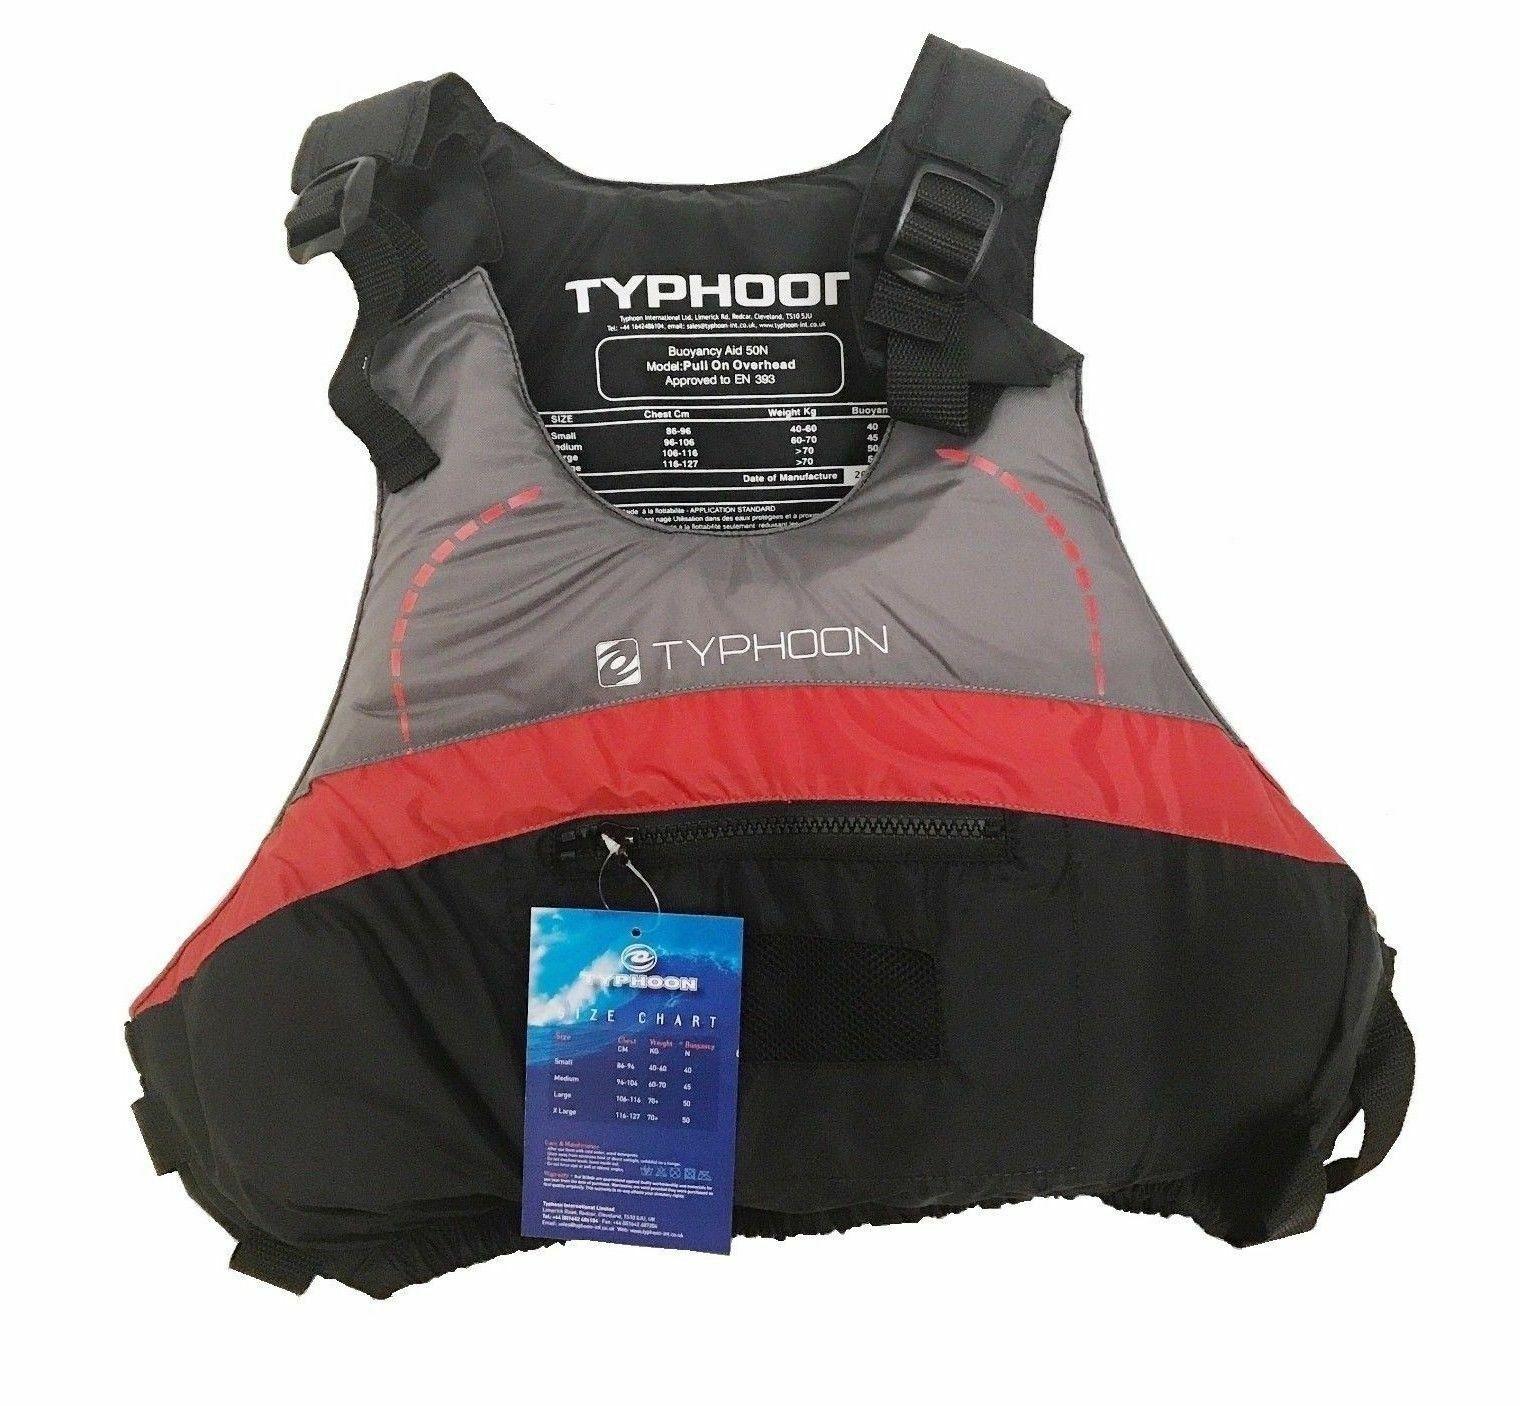 Typhoon Mekong Adjustable Bouyancy Aid, Dinghy Sailing,Windsurfing sup board ski